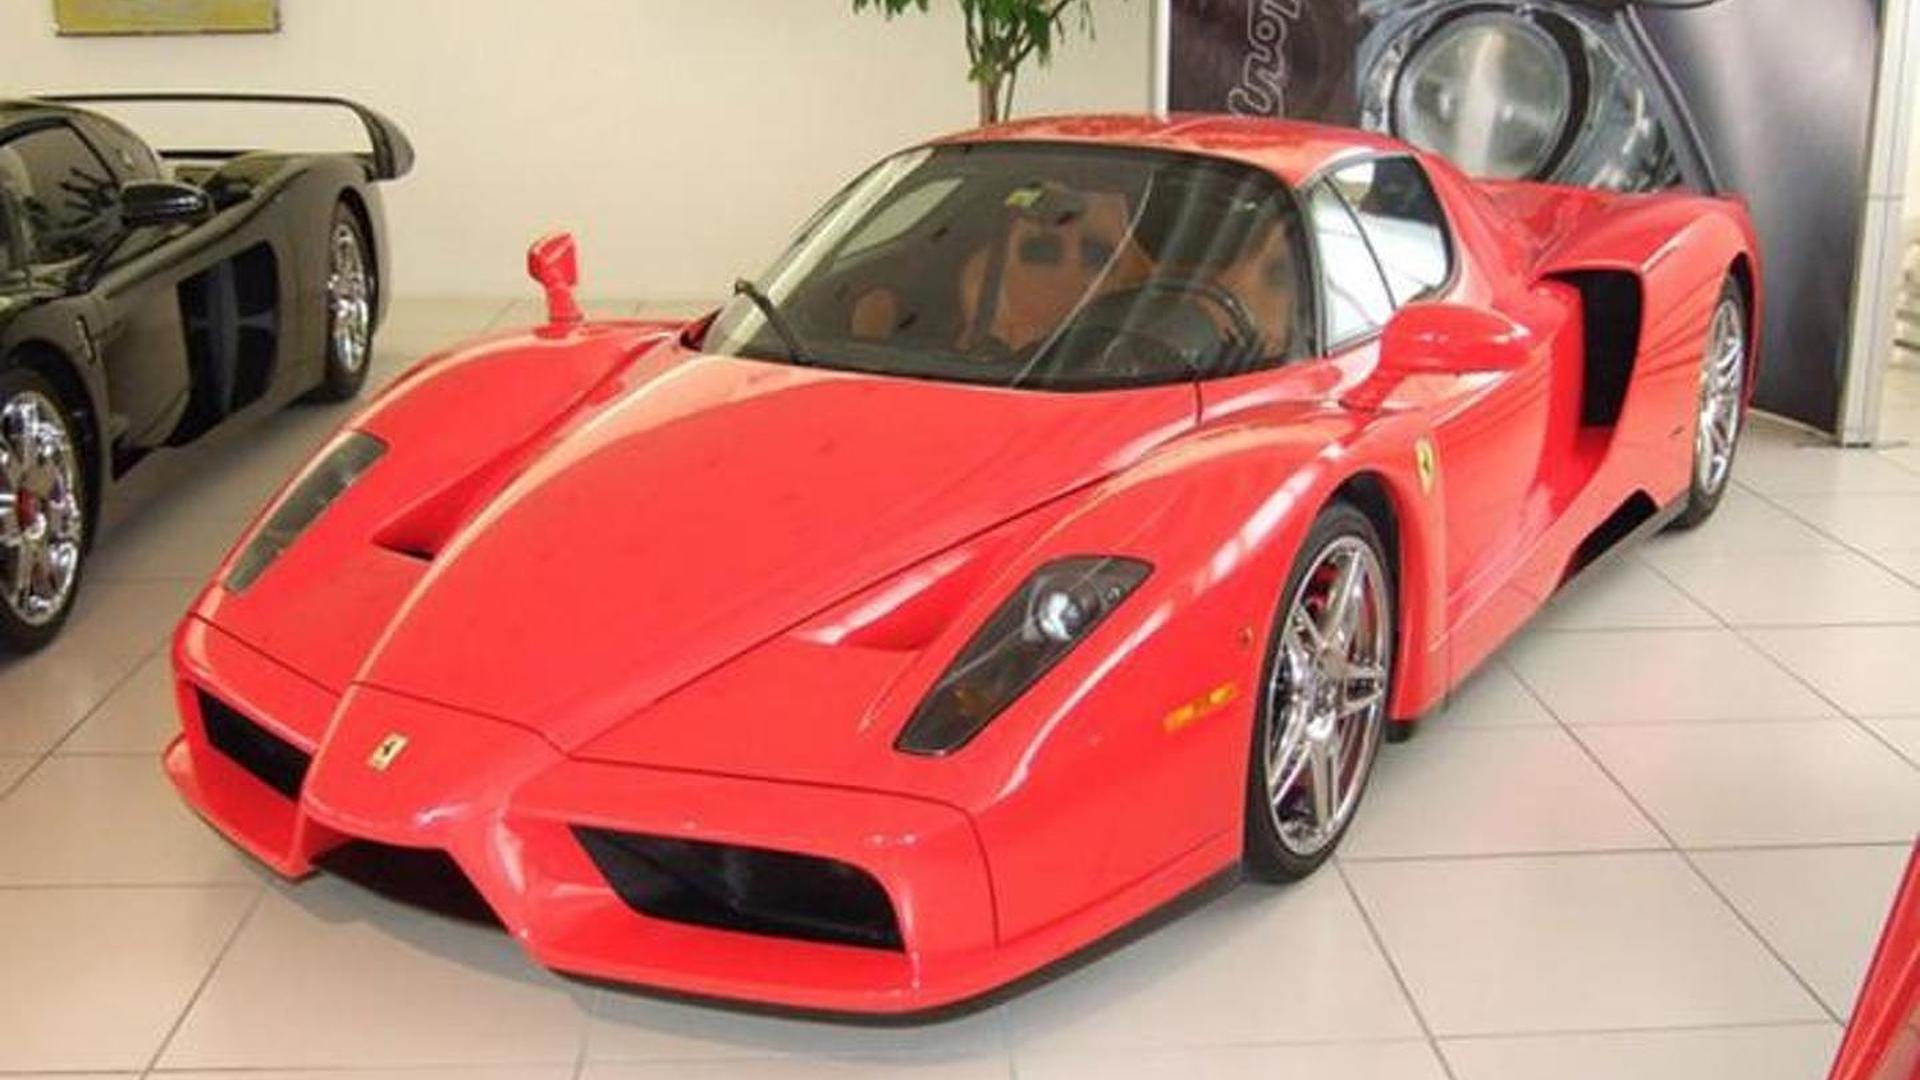 Michael Schumacher\u0027s Ferrari Enzo Up For Sale Again